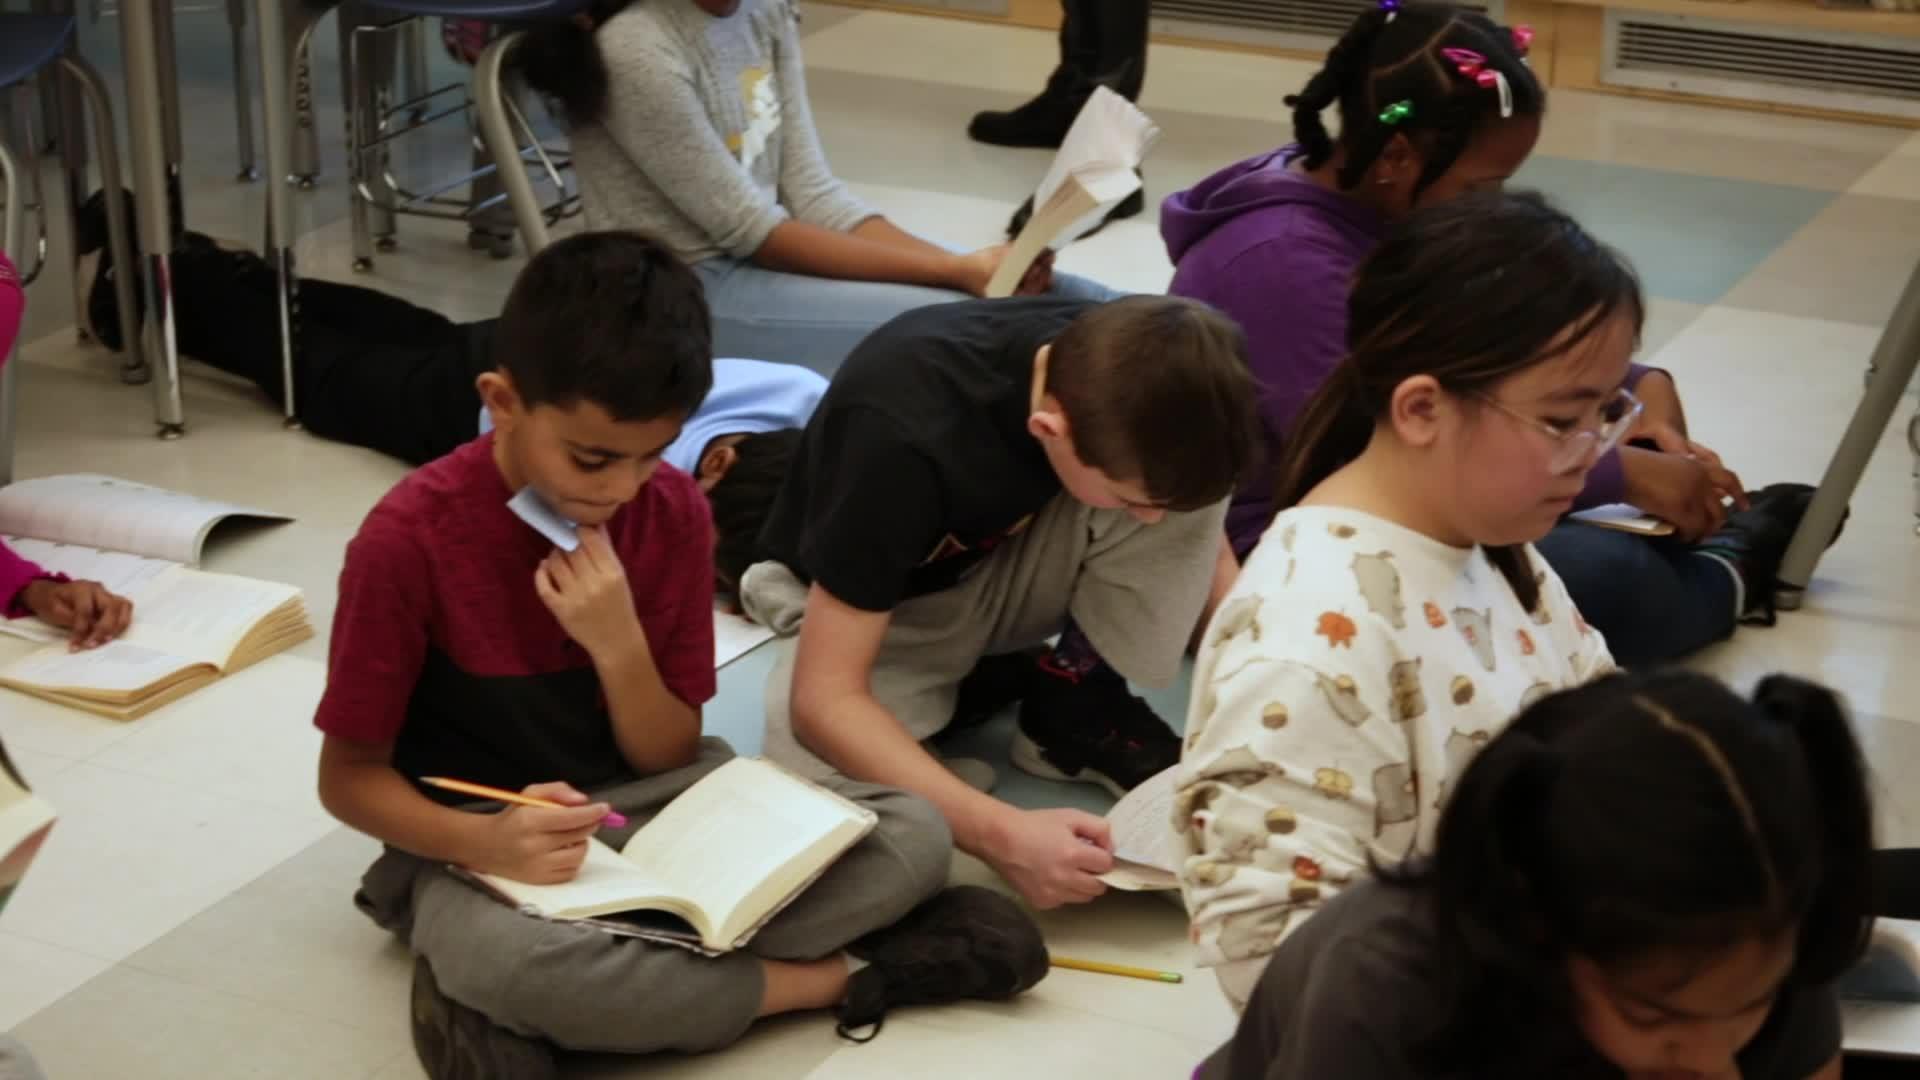 Home – Menlo Park Elementary School Throughout Schedule For Menlo Parkschool District